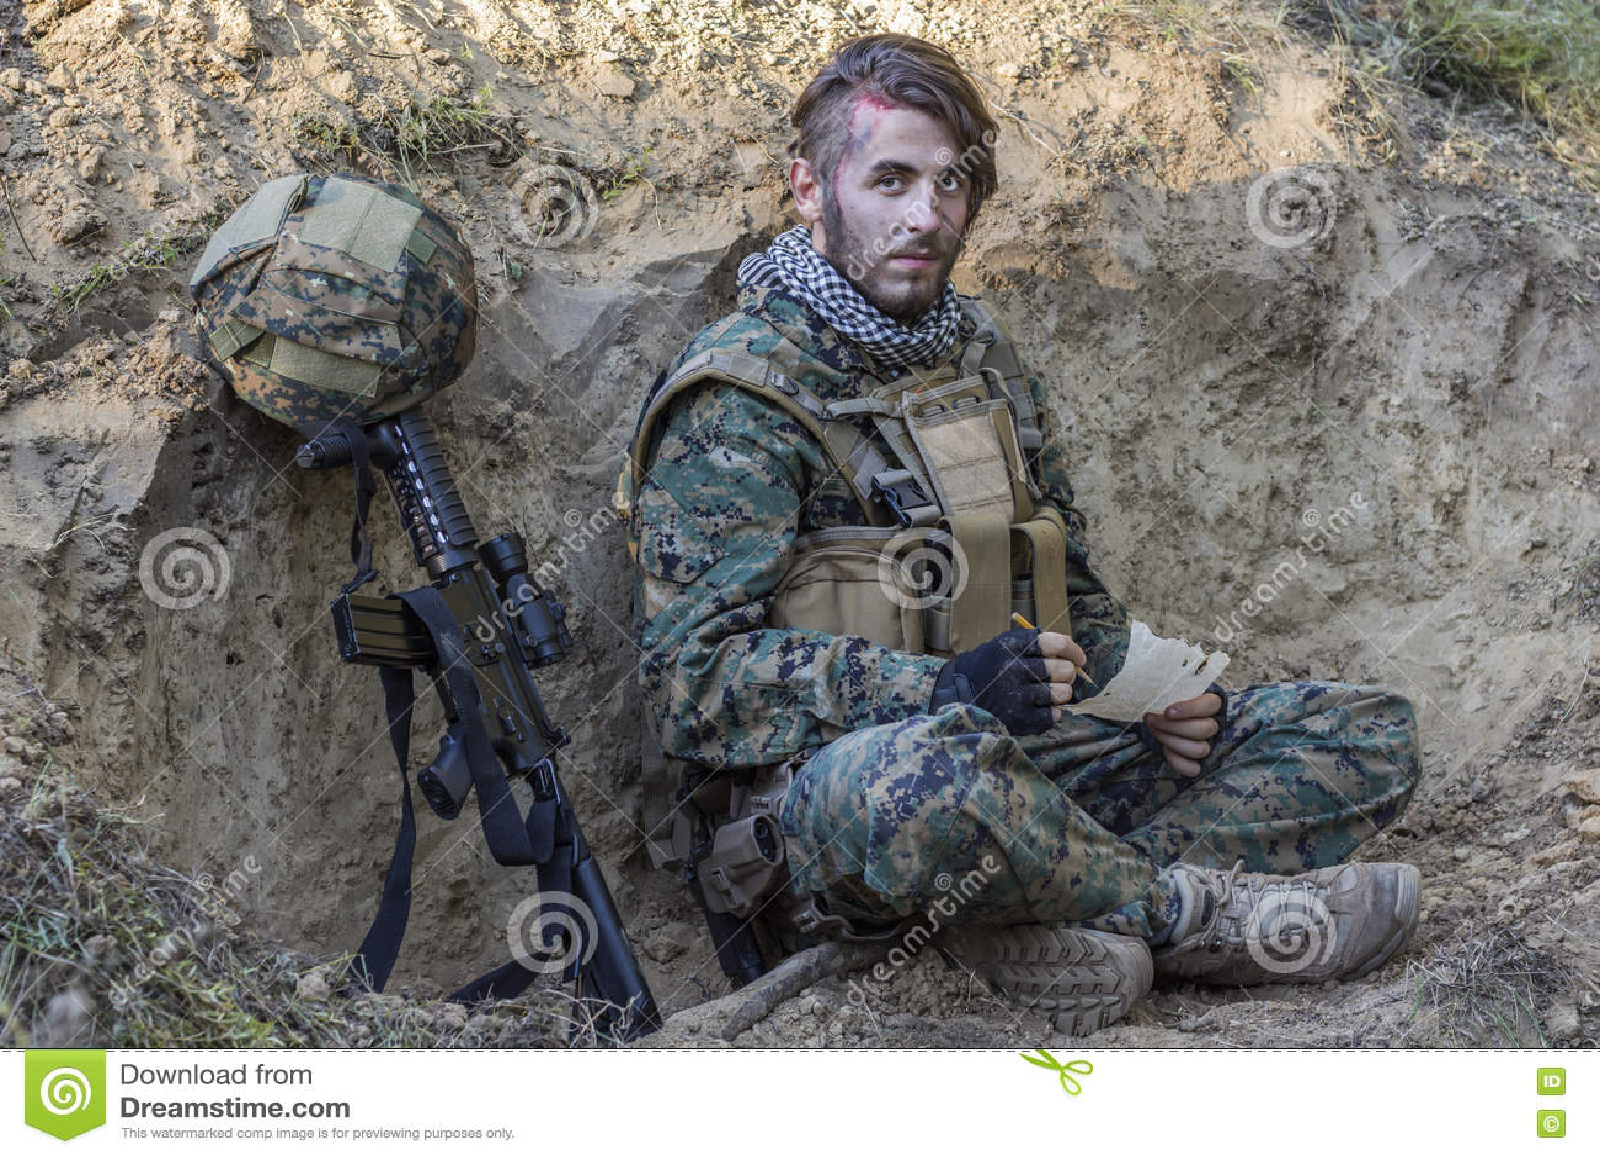 Soldier on the ground with gun